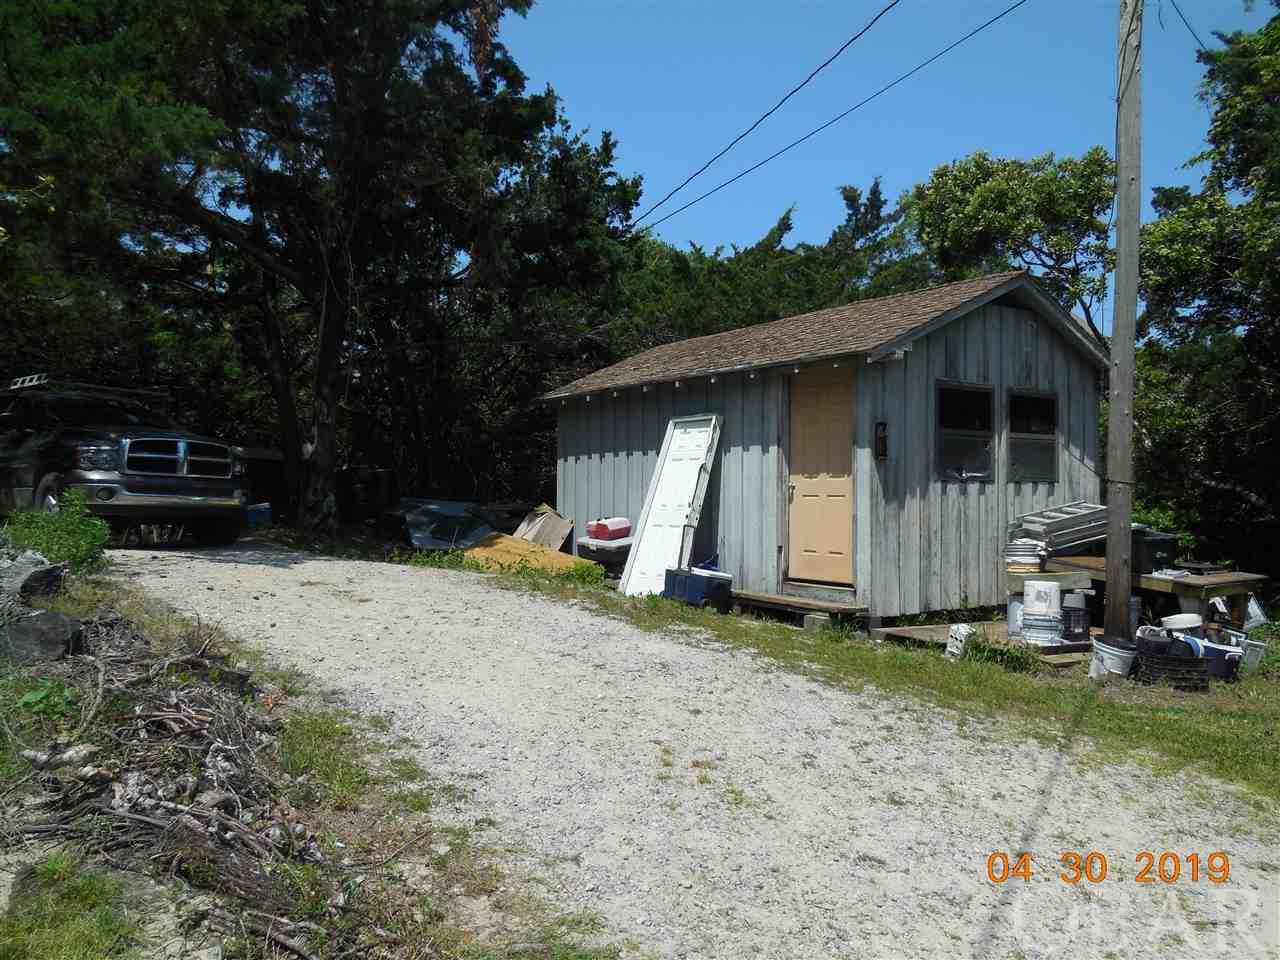 348-middle-road-lot-2-ocracoke-nc-27960